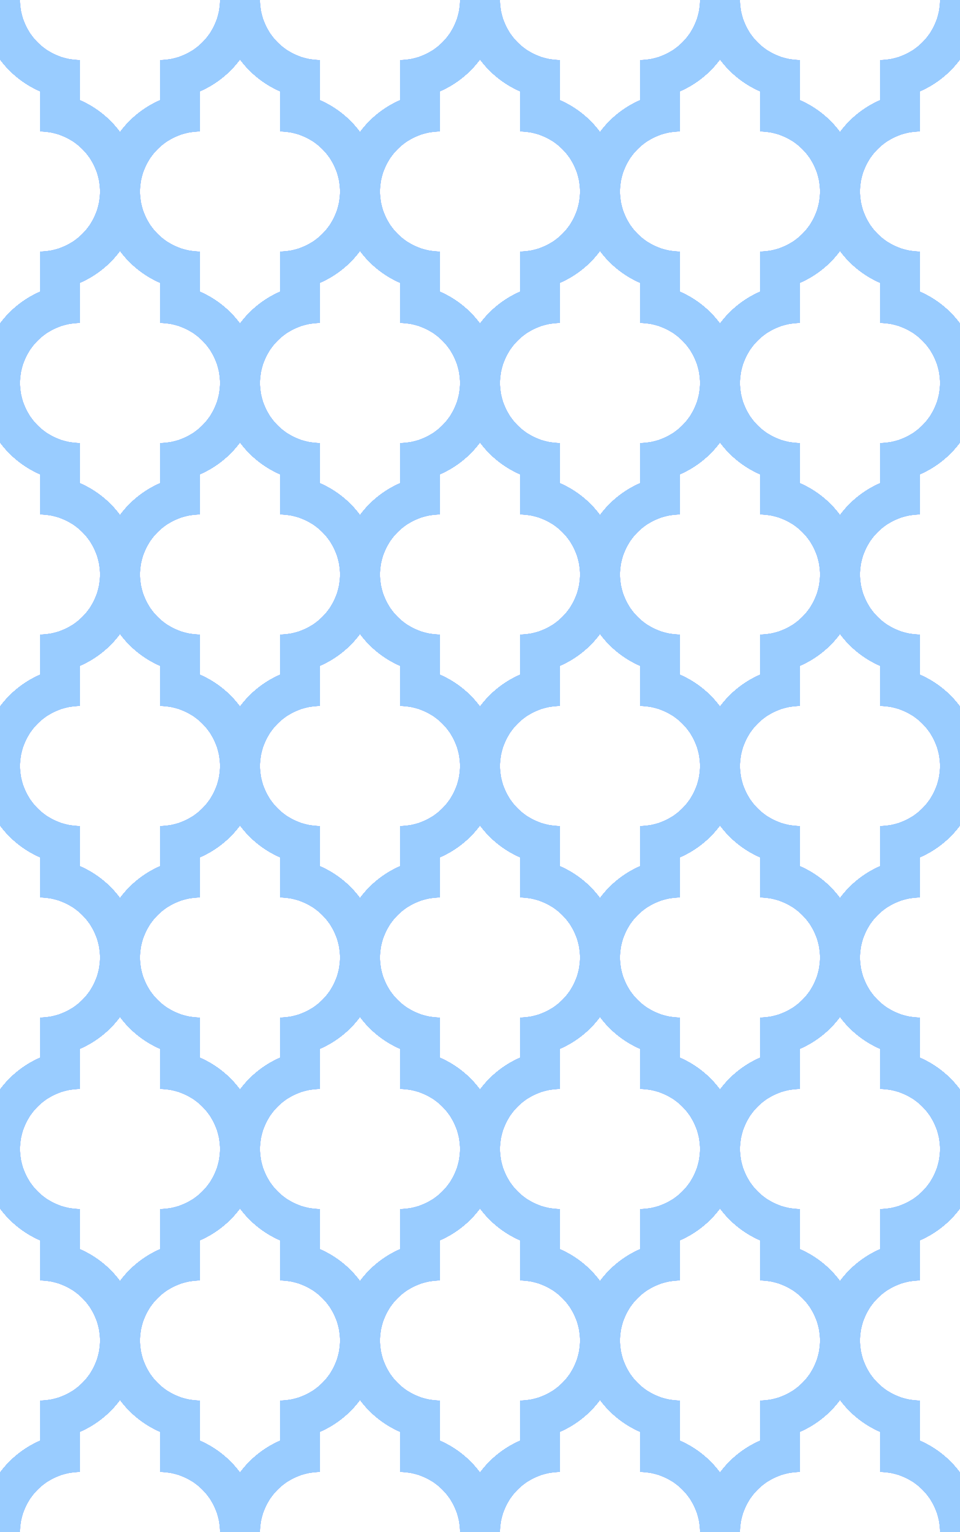 Light Blue Pattern Wallpaper Rr1371718 lattice baby blue 960x1532